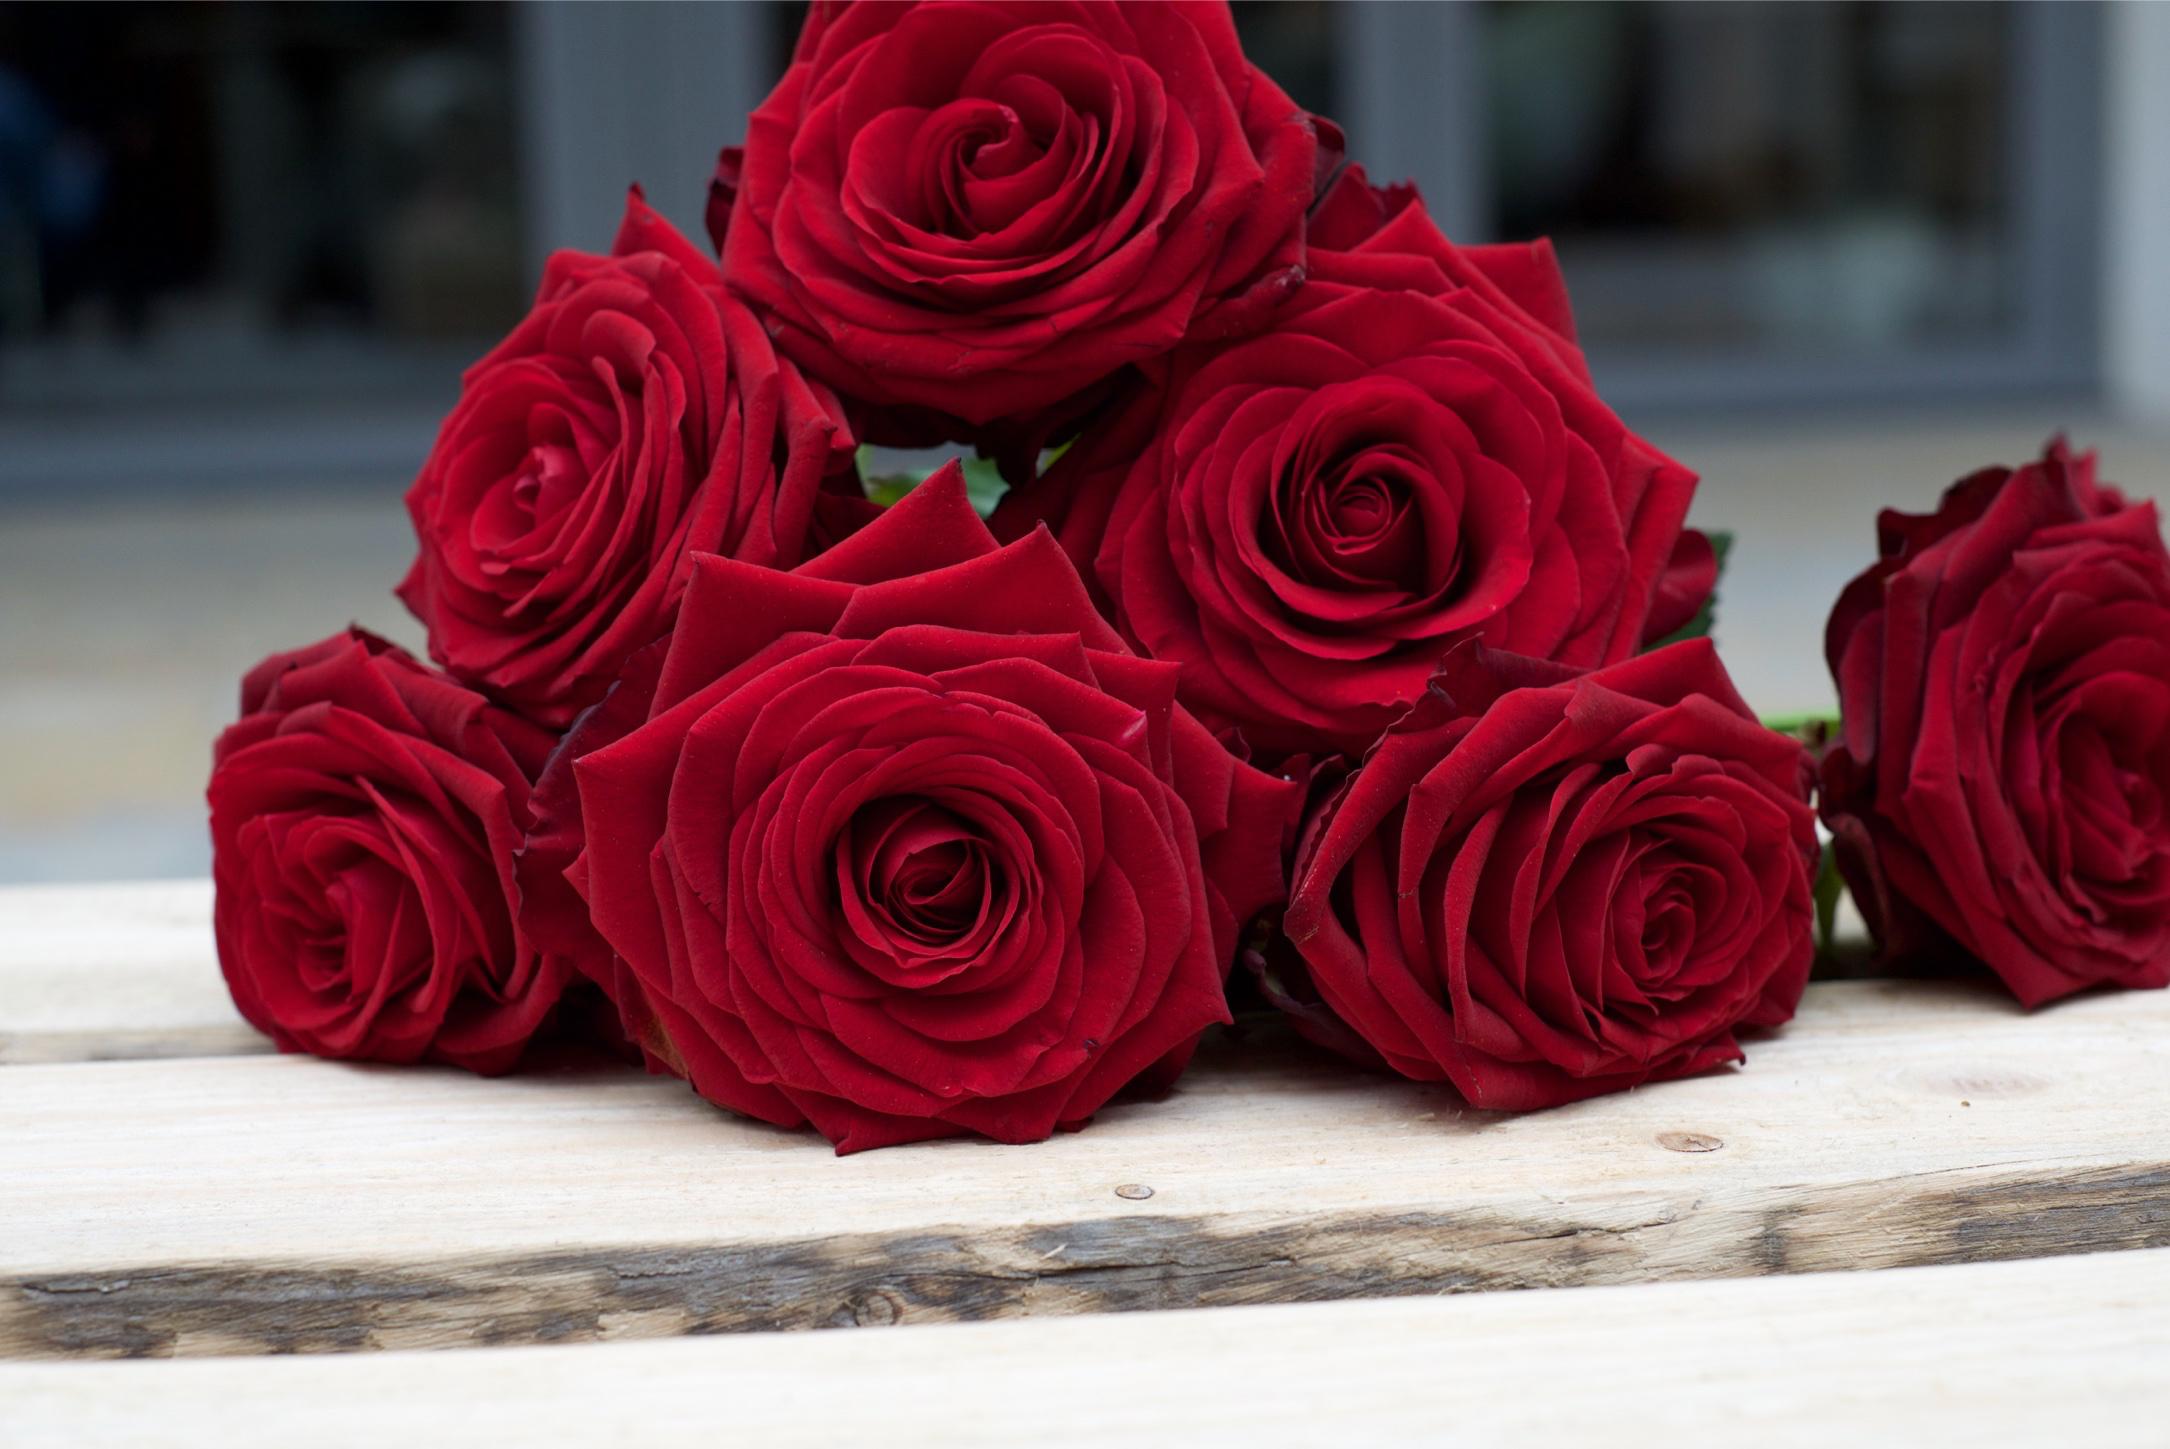 Rode rozen op kist - Afscheidsfotografie x STiP Fotografie